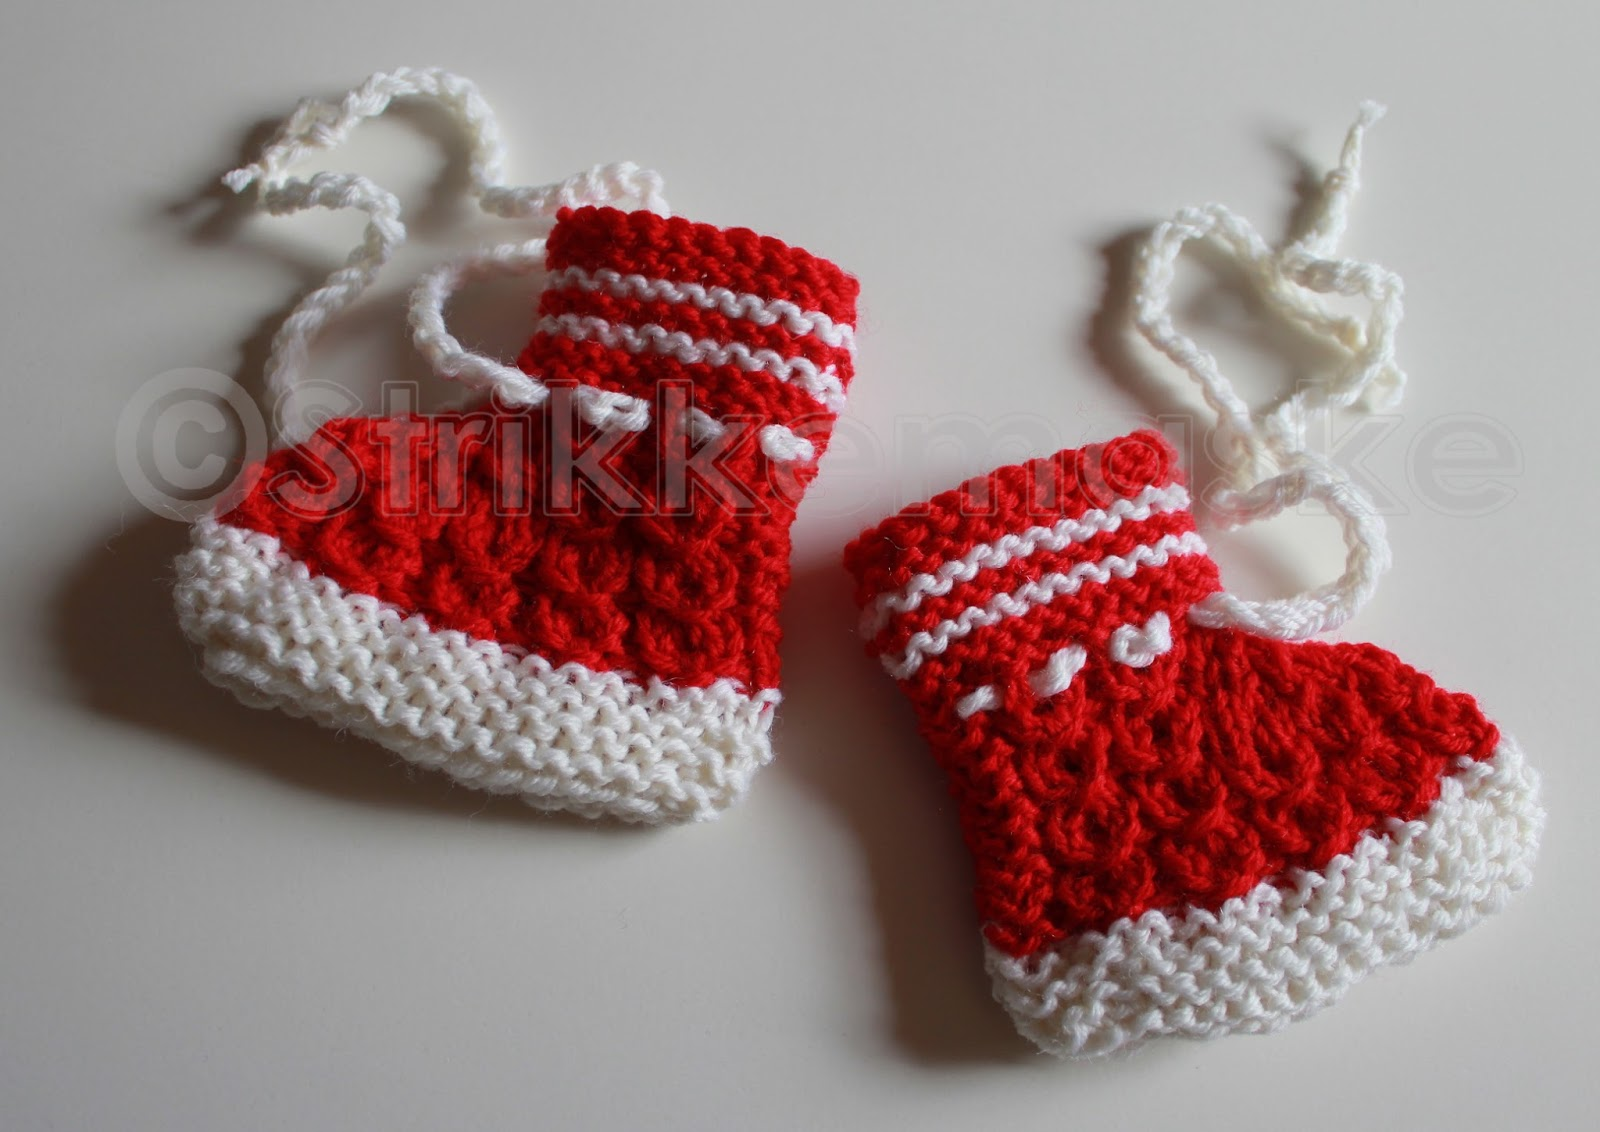 Strikka knallrøde babybooties